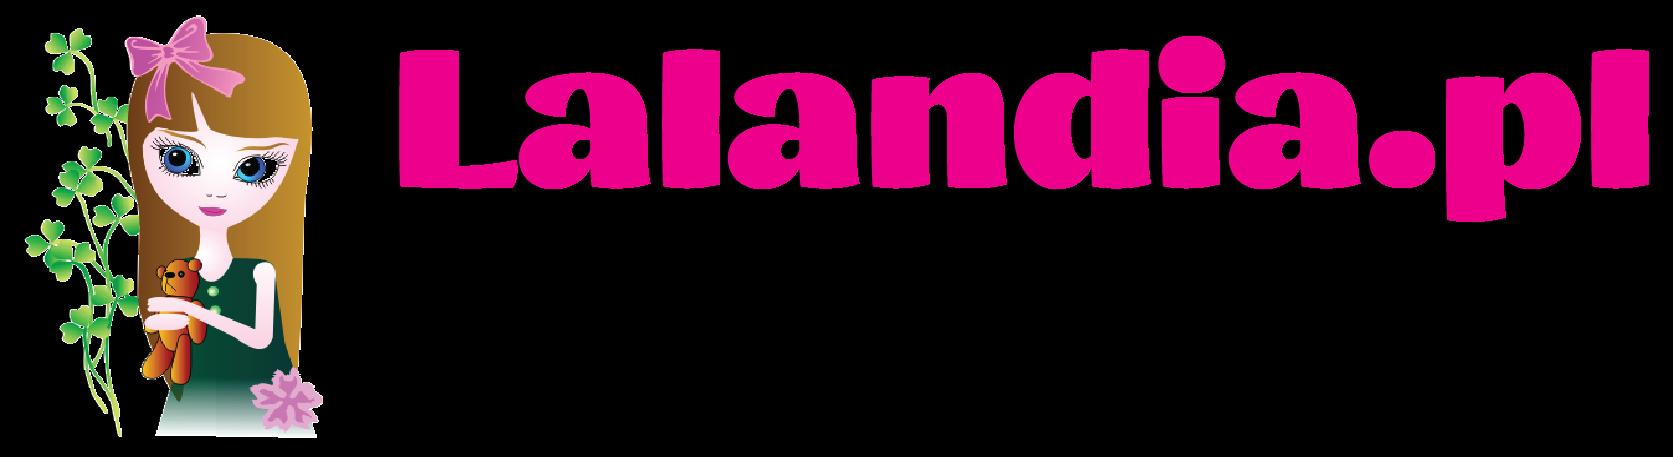 Lalandia